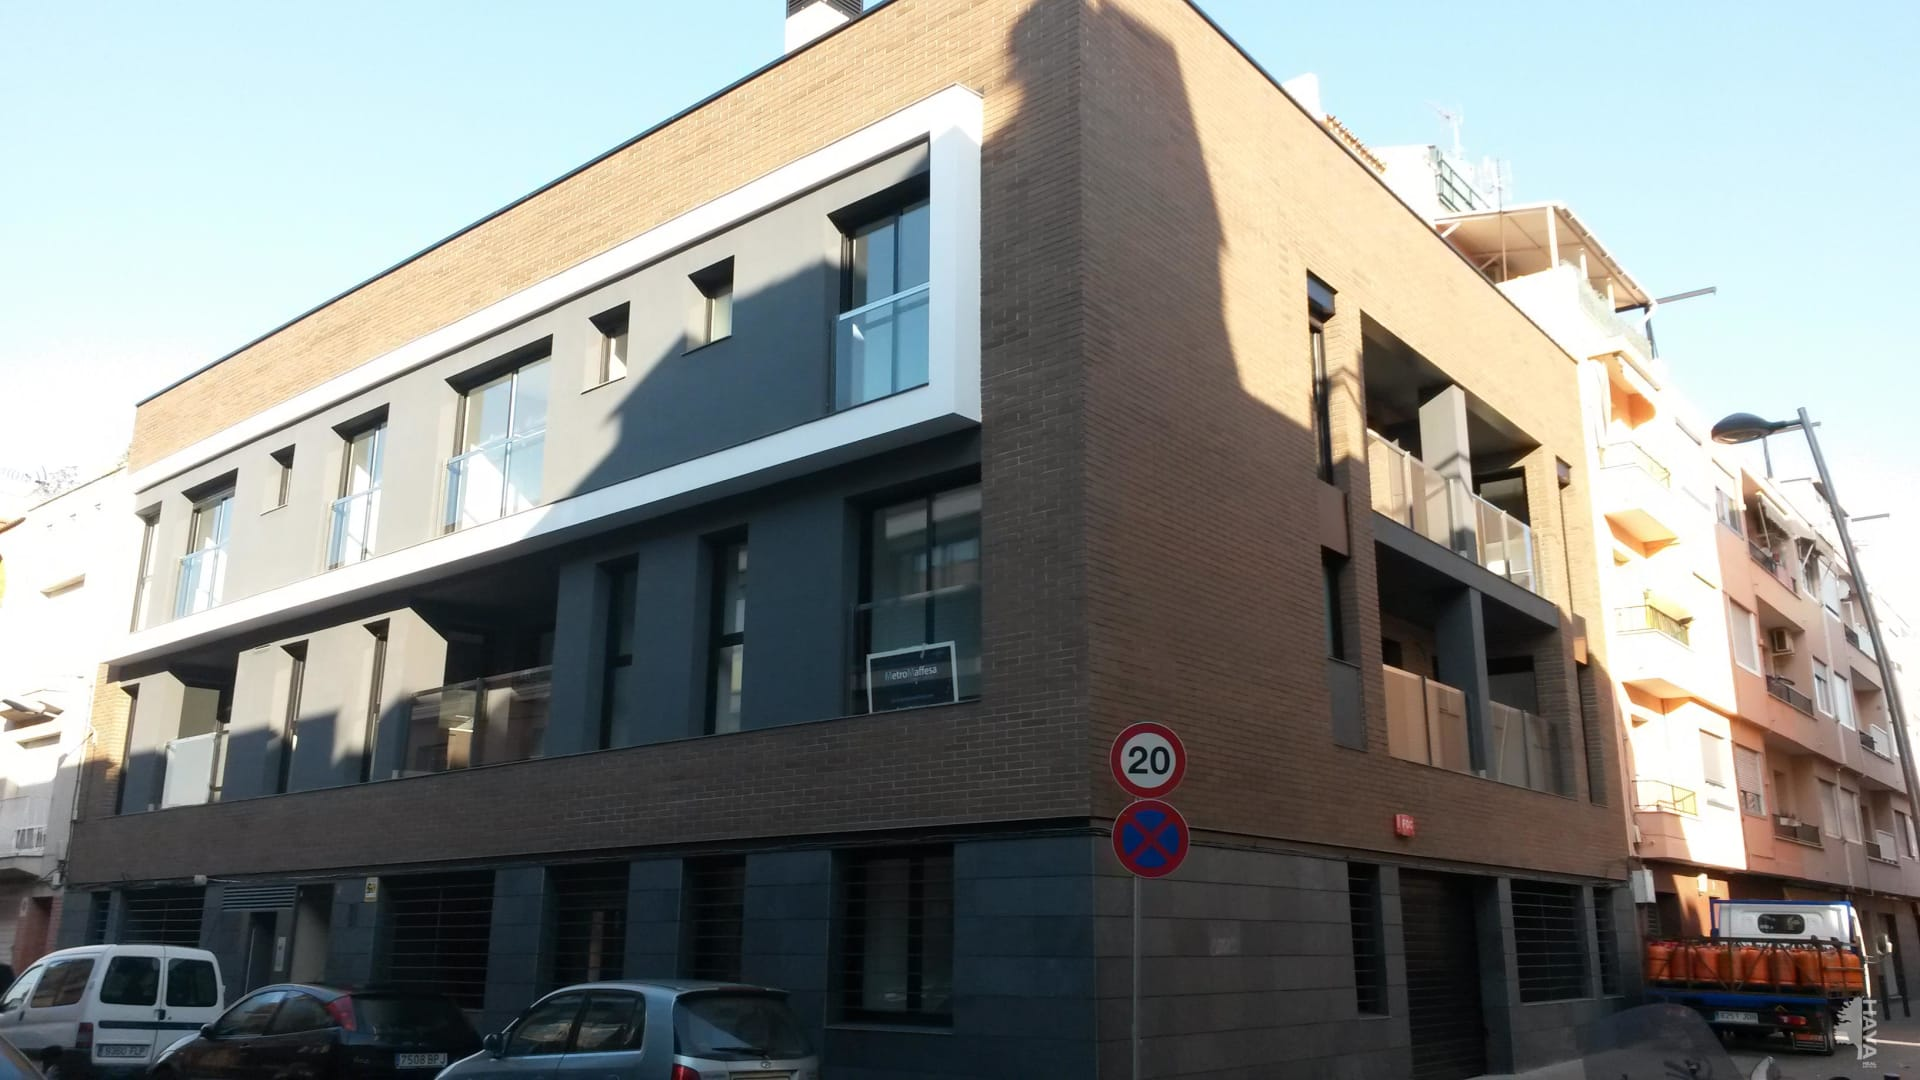 Oficina en venta en La Llagosta, Barcelona, Calle Sant Francesc, 205.200 €, 88 m2